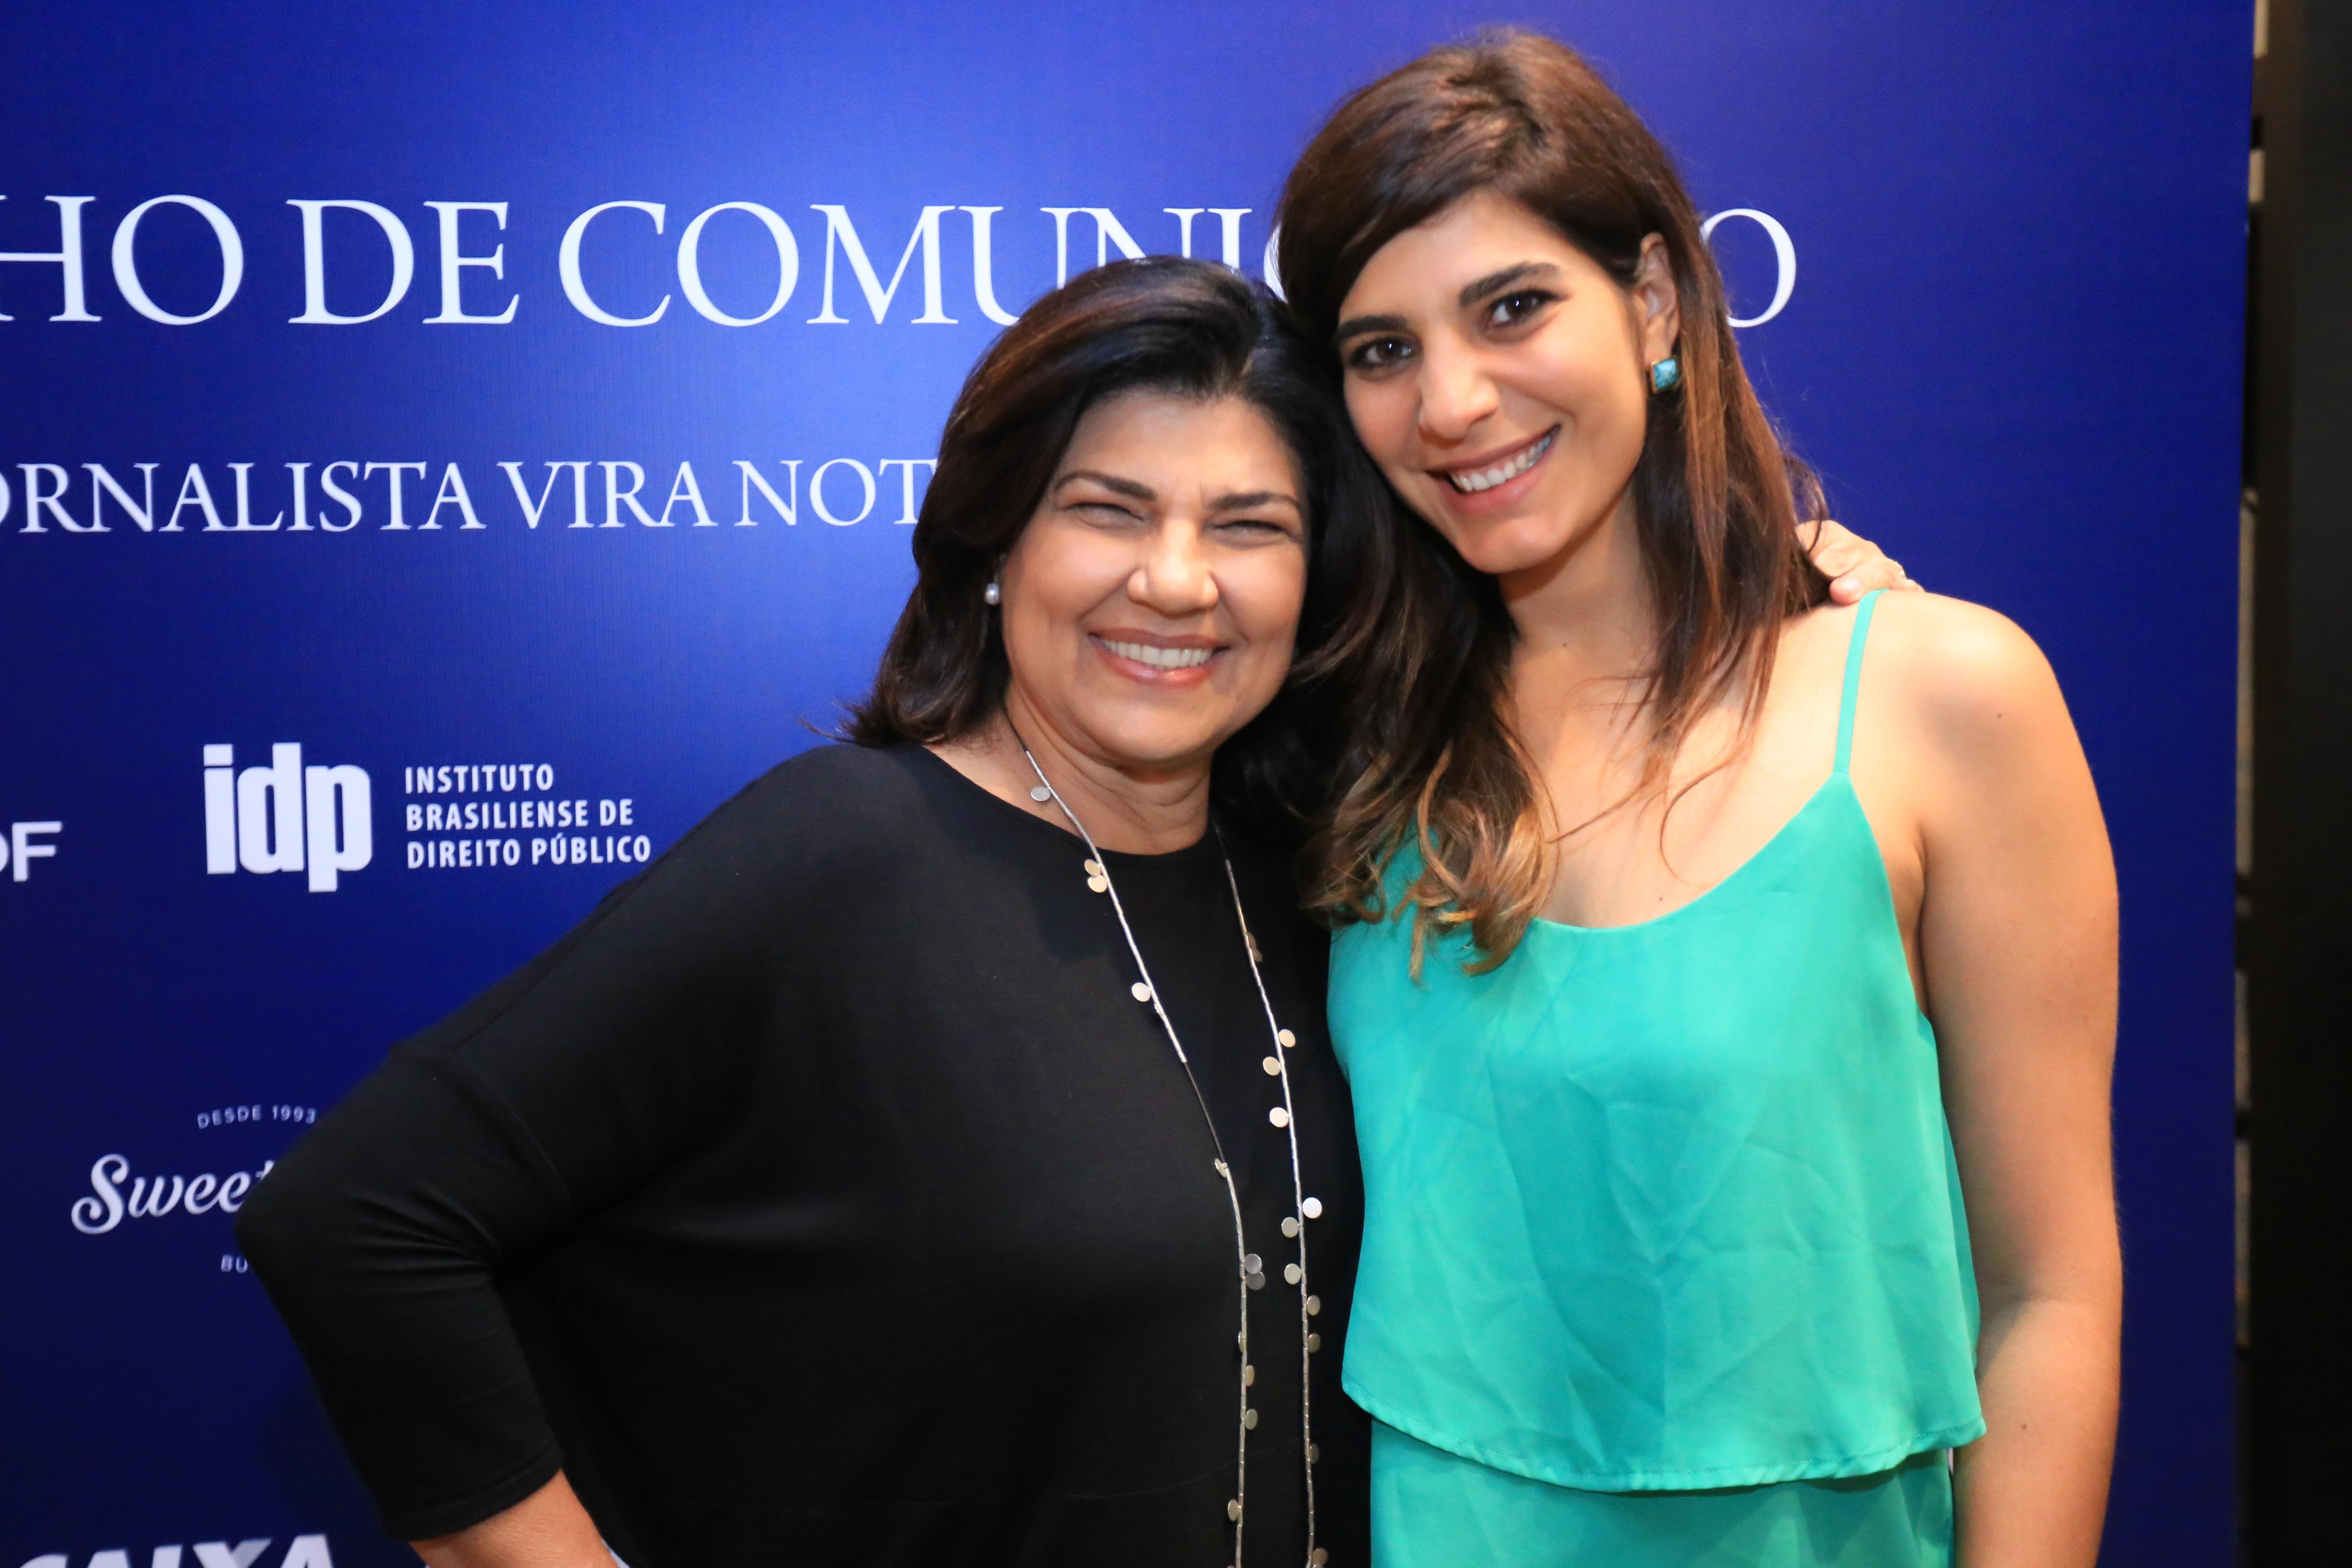 As jornalistas Cristiana Lobo e a Andréia Sadi